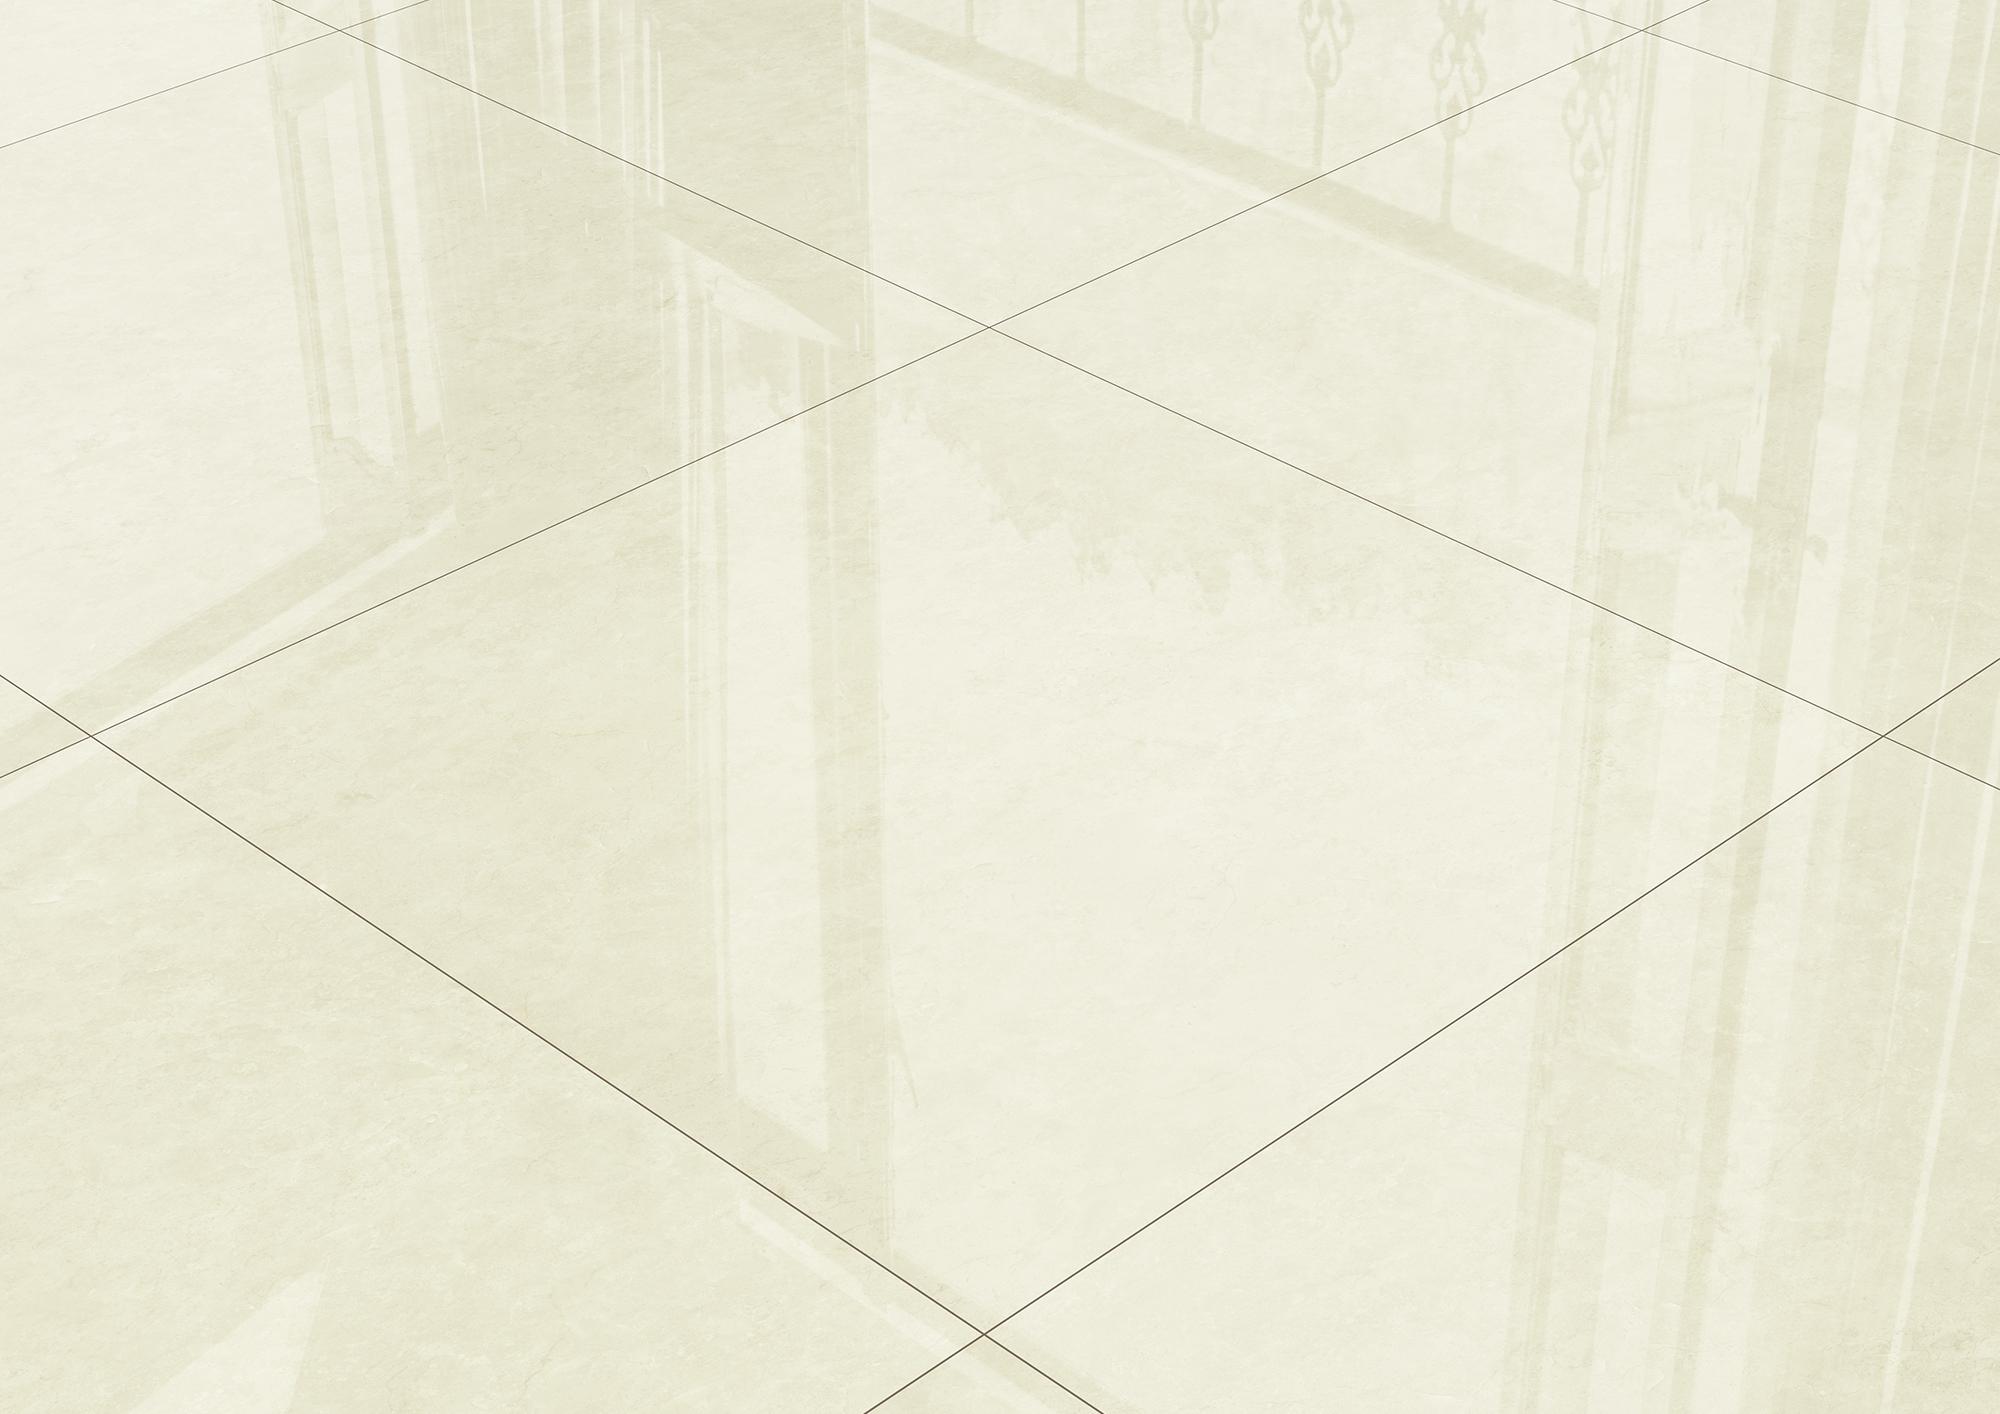 Kollektion_M #6MM crema - Ceramic District